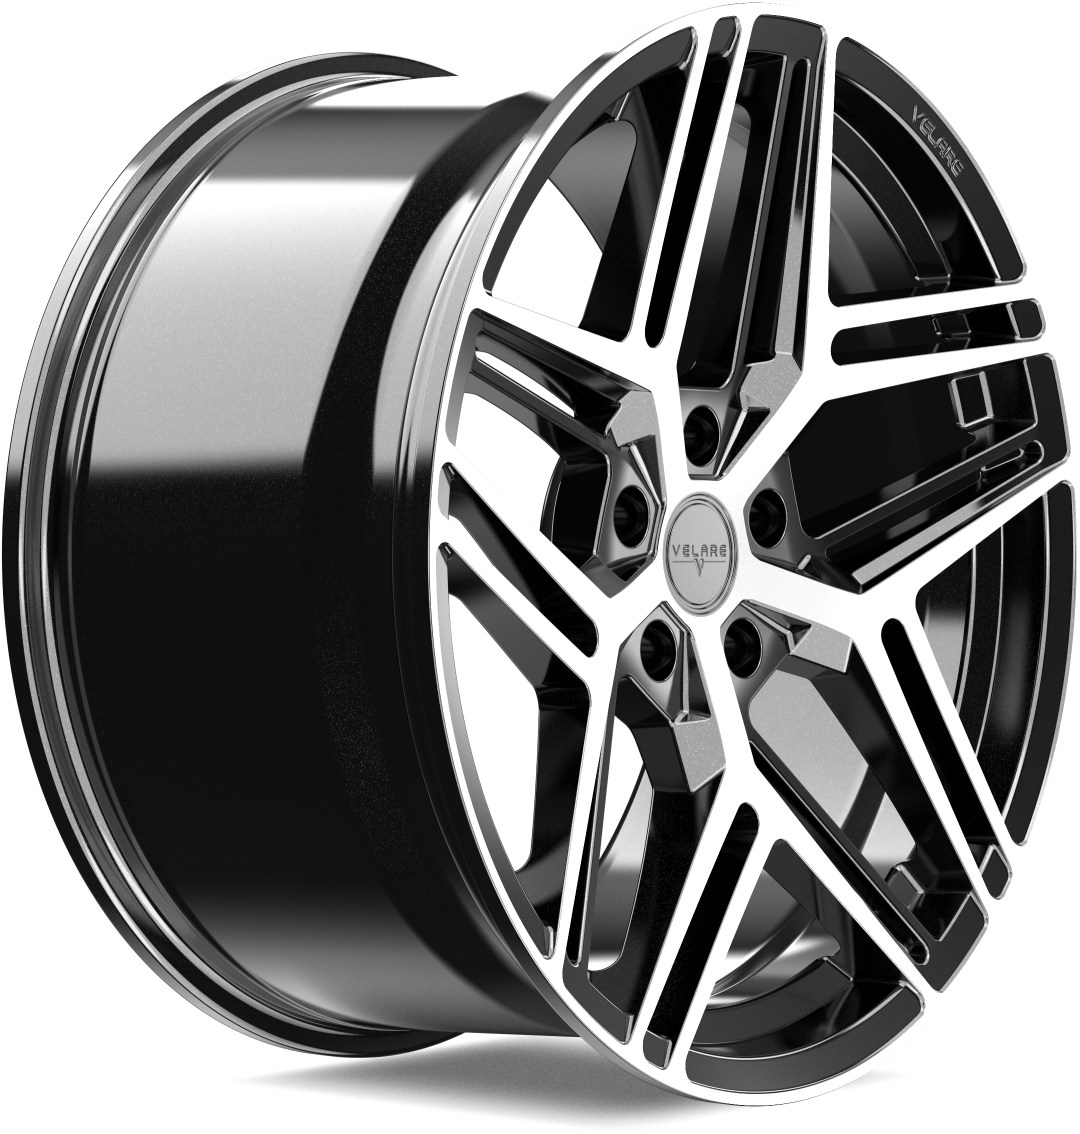 Velare VLR16 10j 20 Diamond Black Machined Face 3